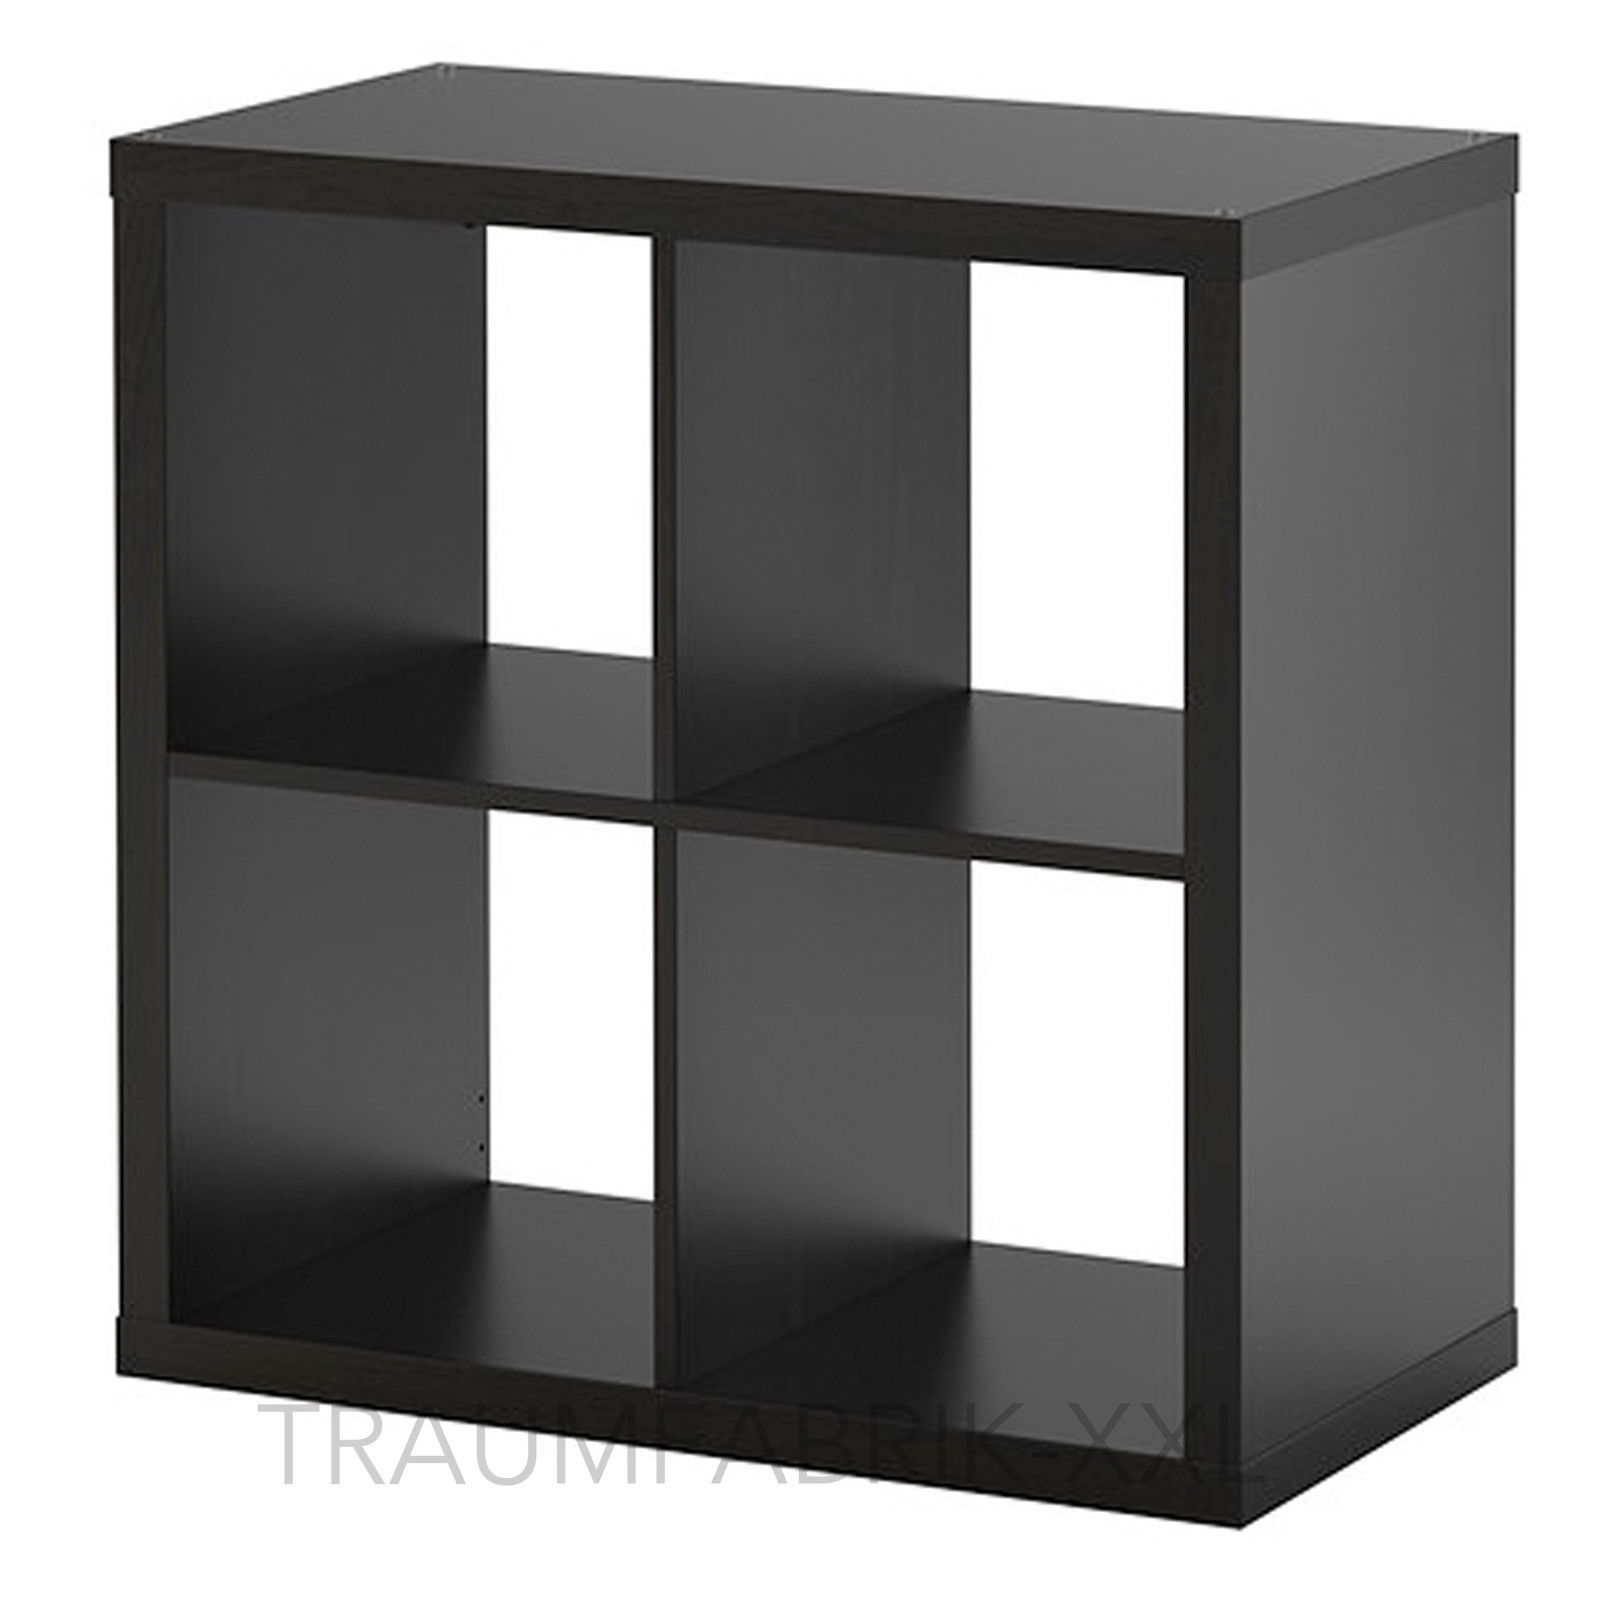 ikea kallax stauraumregal schwarz braun 77x77cm. Black Bedroom Furniture Sets. Home Design Ideas